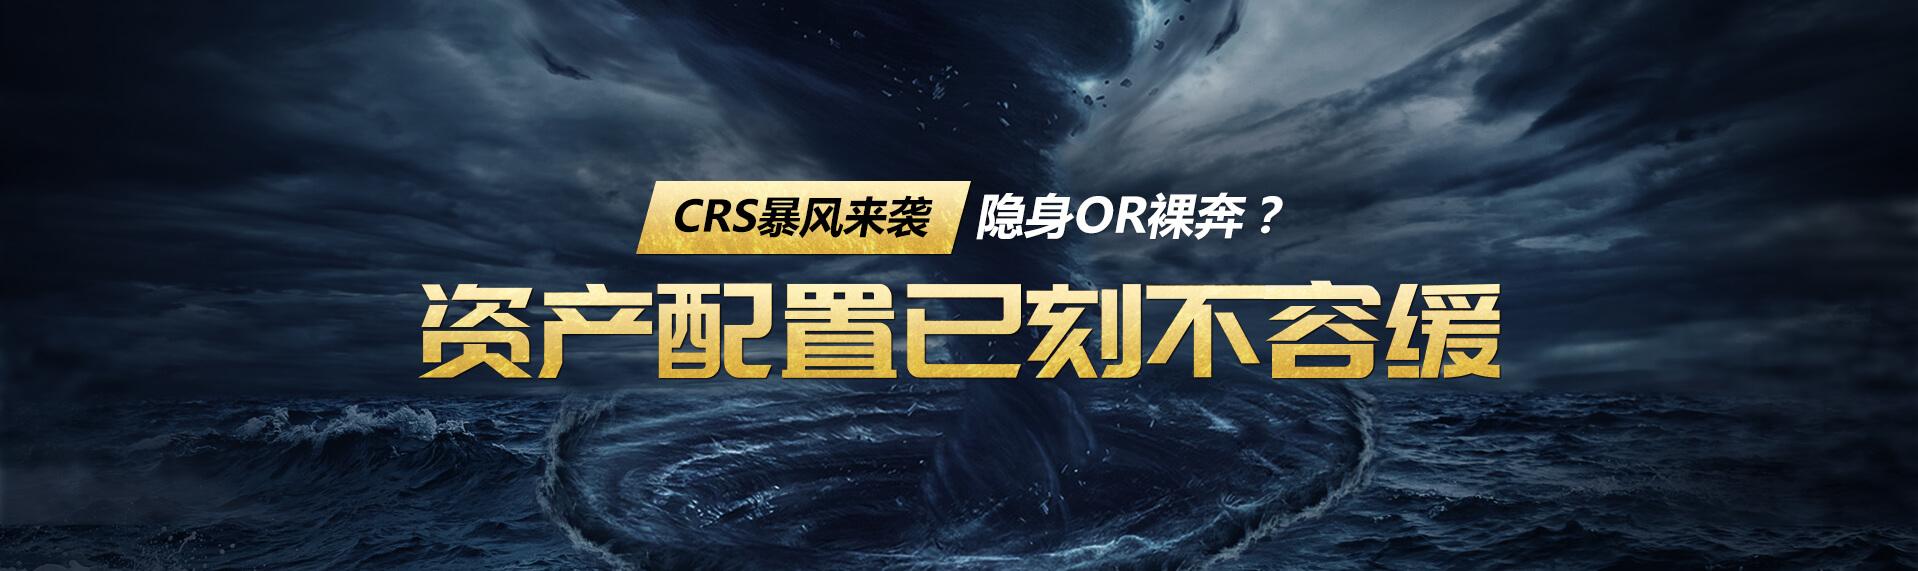 CRS究竟是何方神圣?